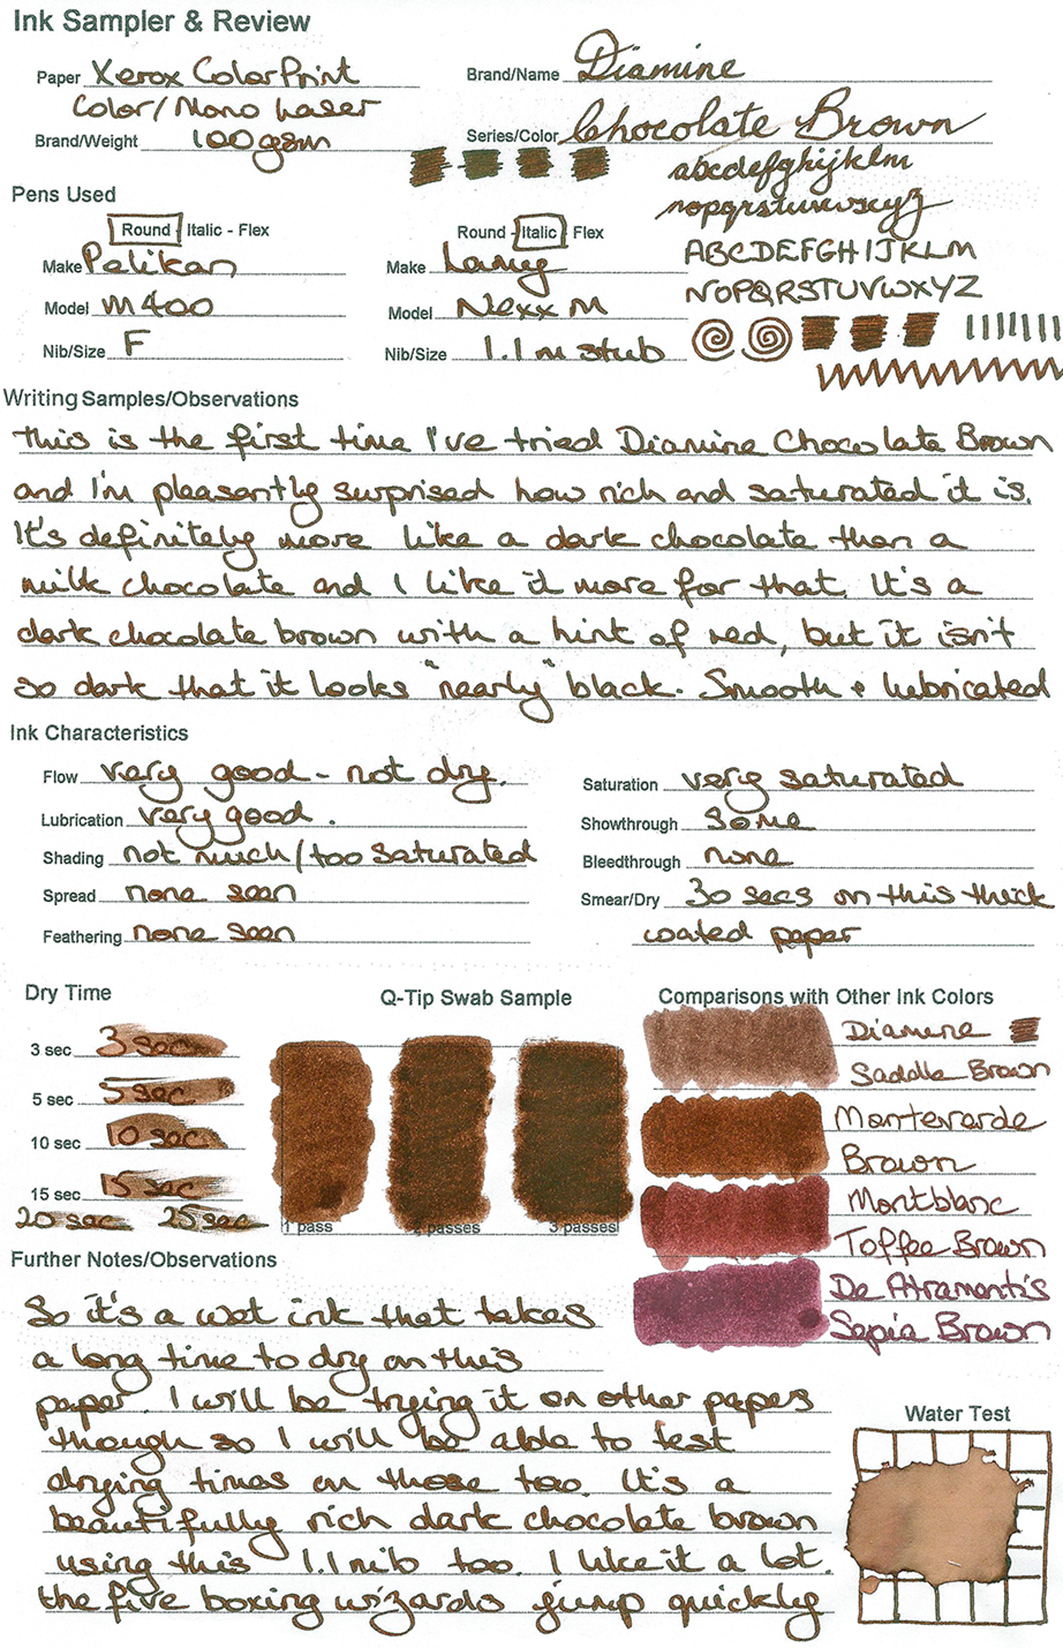 fpn_1484741467__diamine_chocolate_brown.